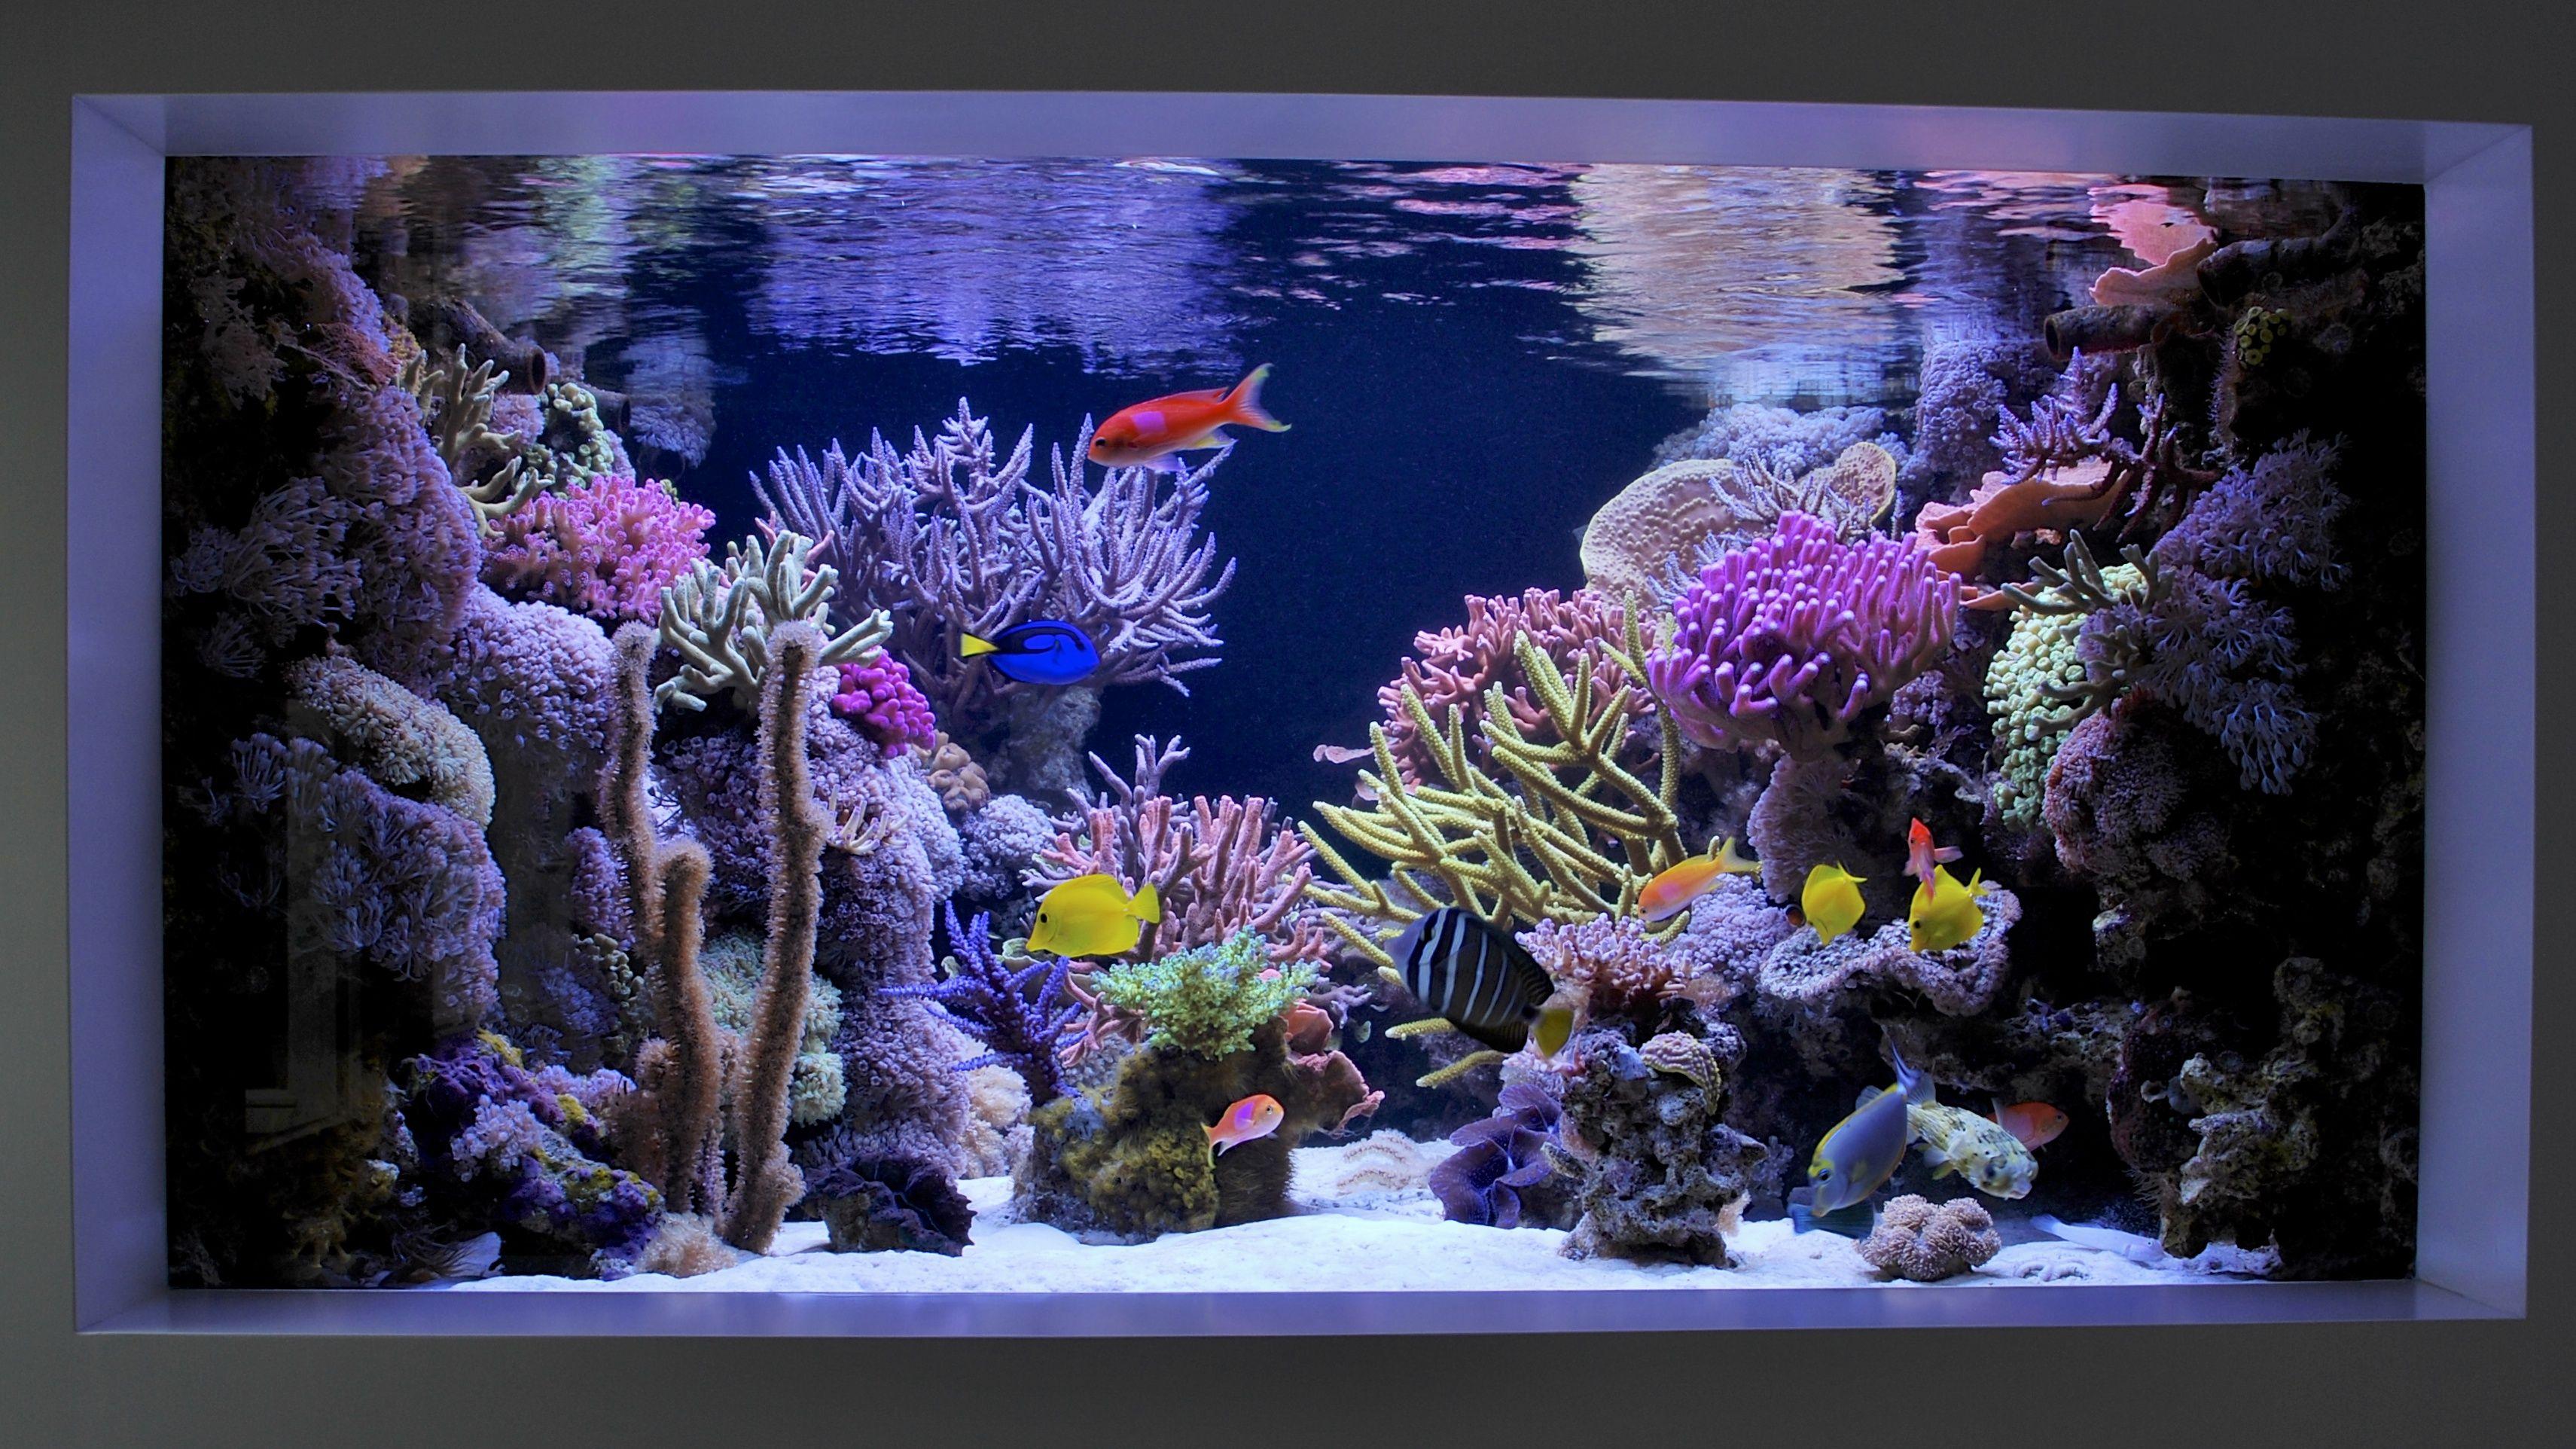 seabed s aquarium background fish ocean p sides ebay coral reef decoration decor vepotek double